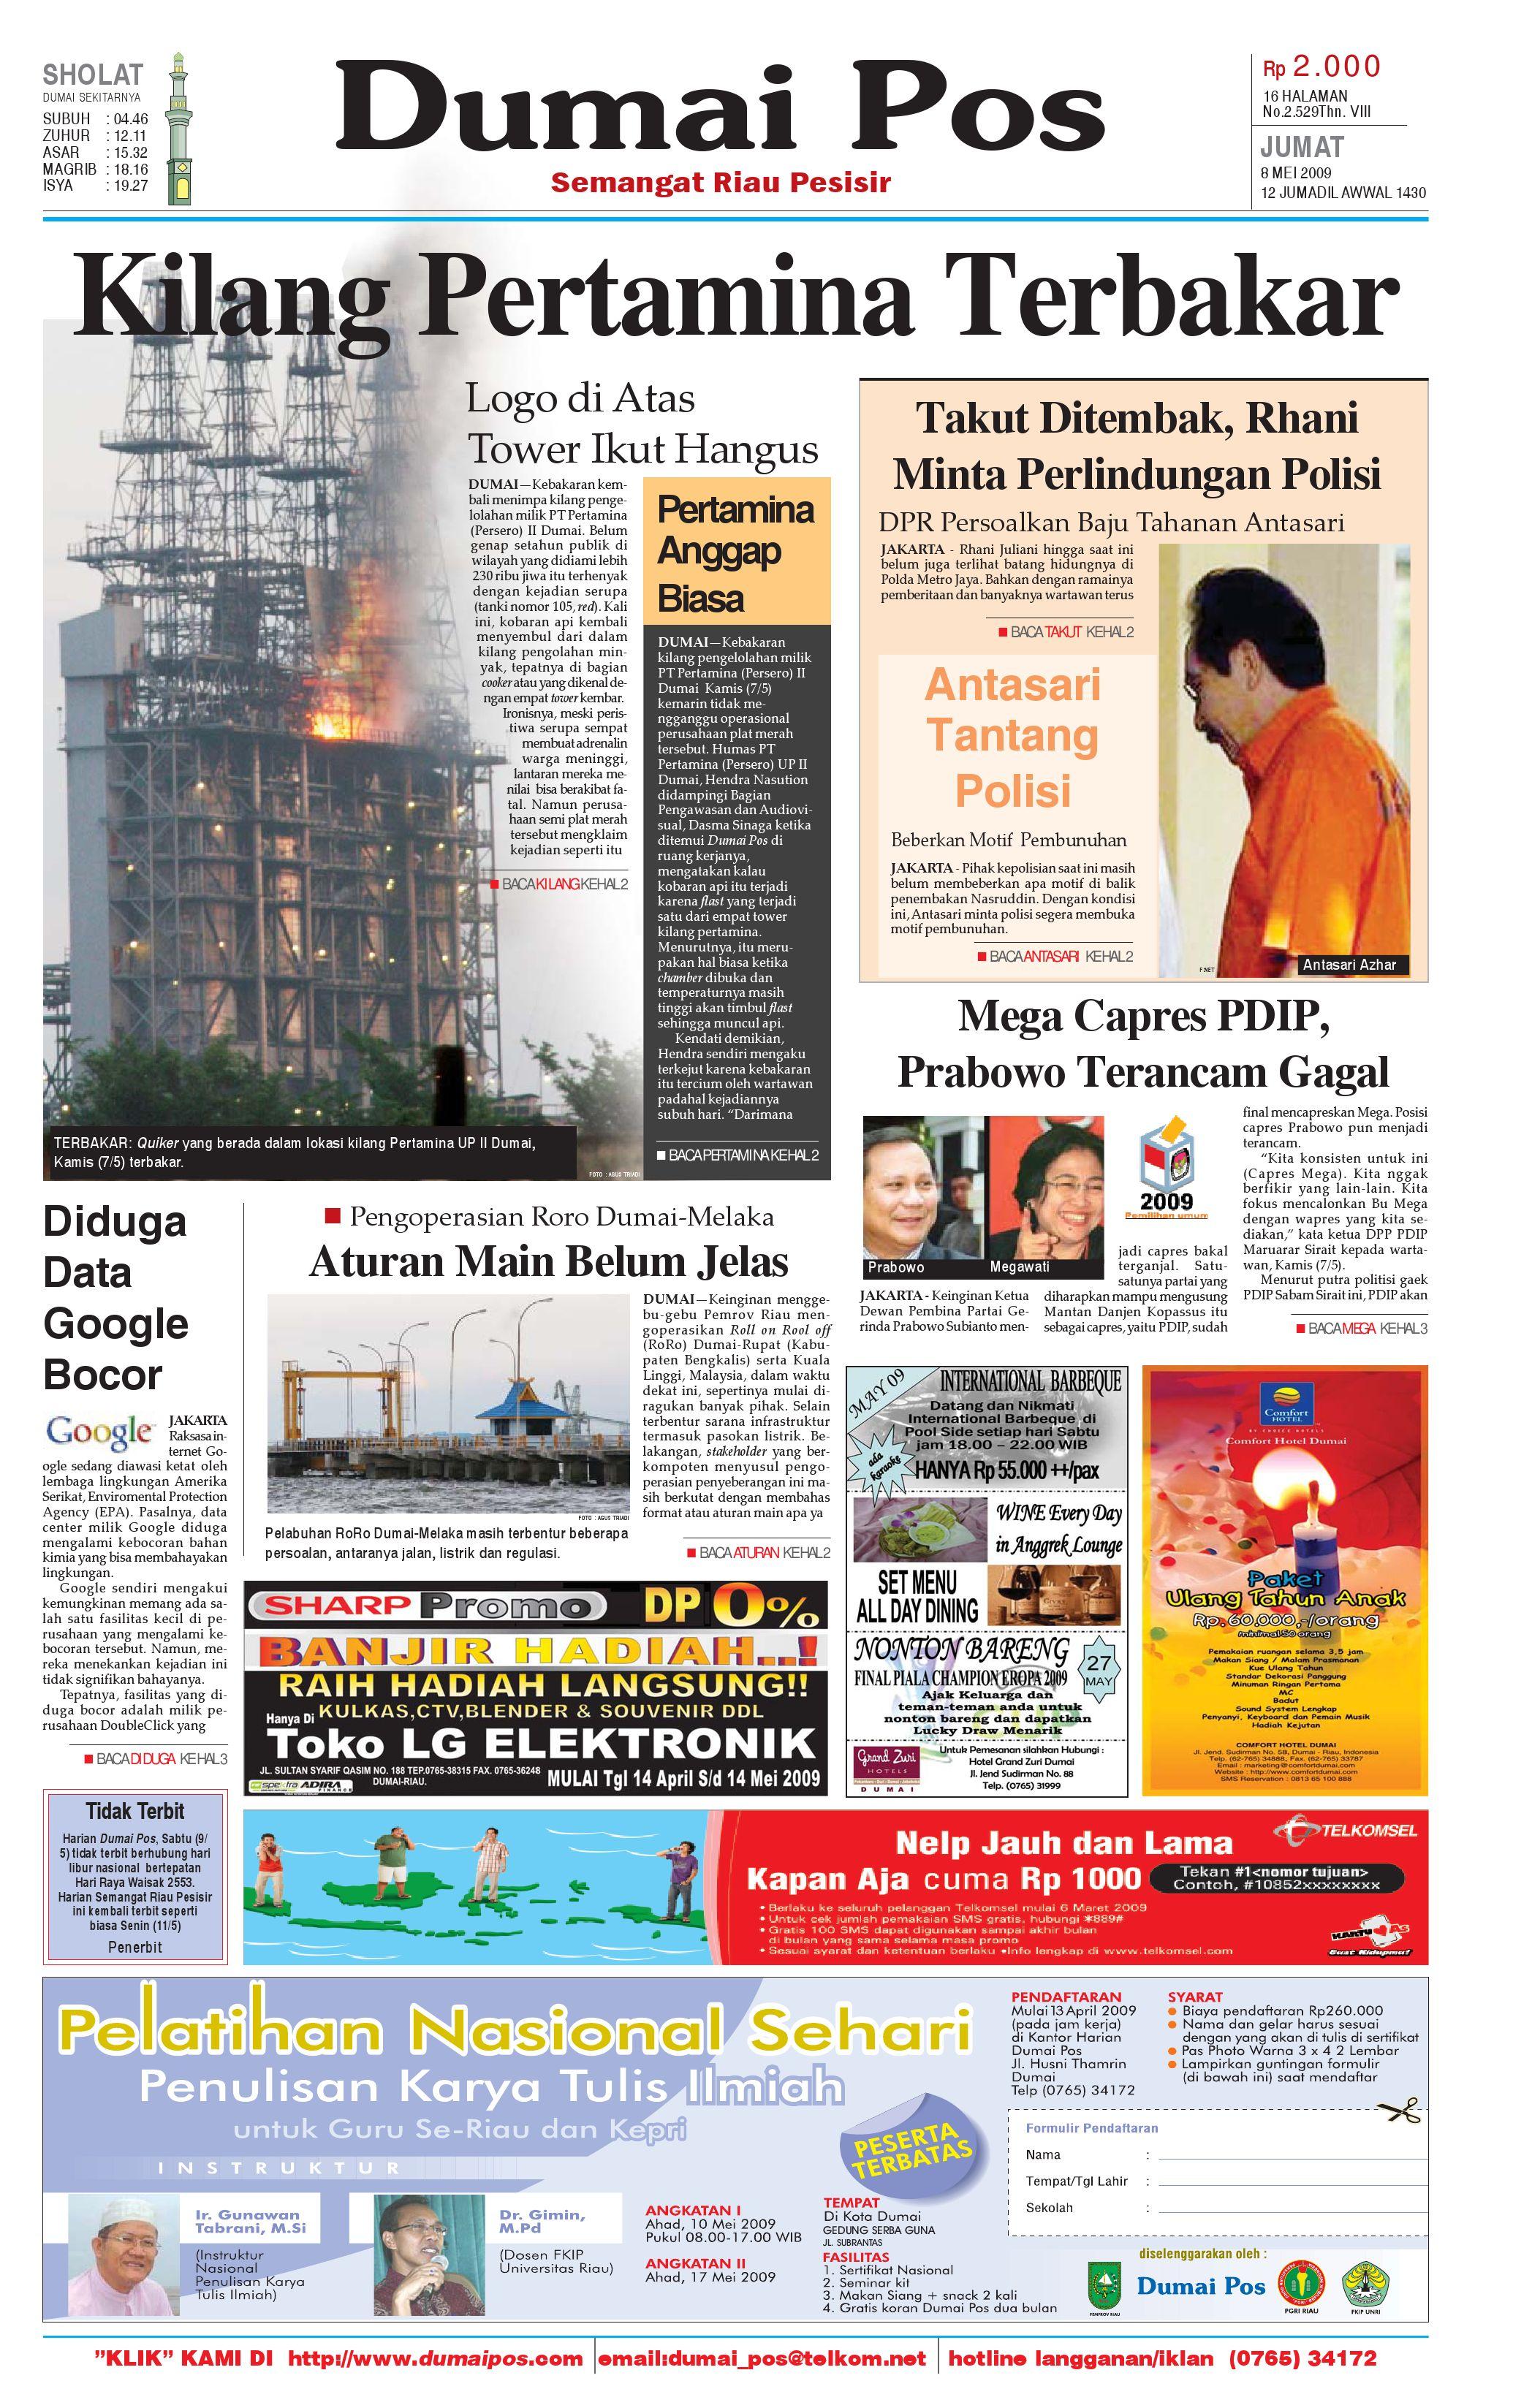 Dumai Pos 8 Mei 2009 By Issuu Produk Ukm Bumn Tenun Pagatan Kemeja Pria Biru Kapal